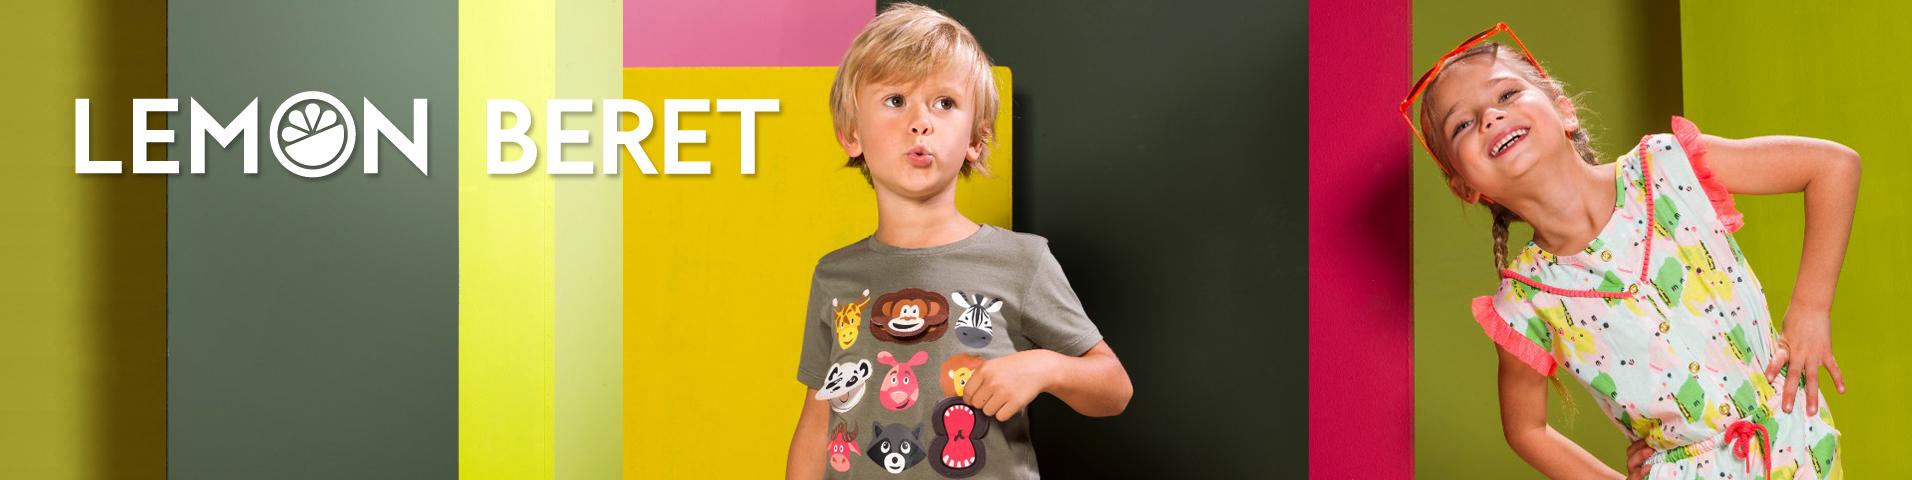 Kinderkleding Zalando.Lemon Beret Alles Fur Dein Kind Bei Zalando